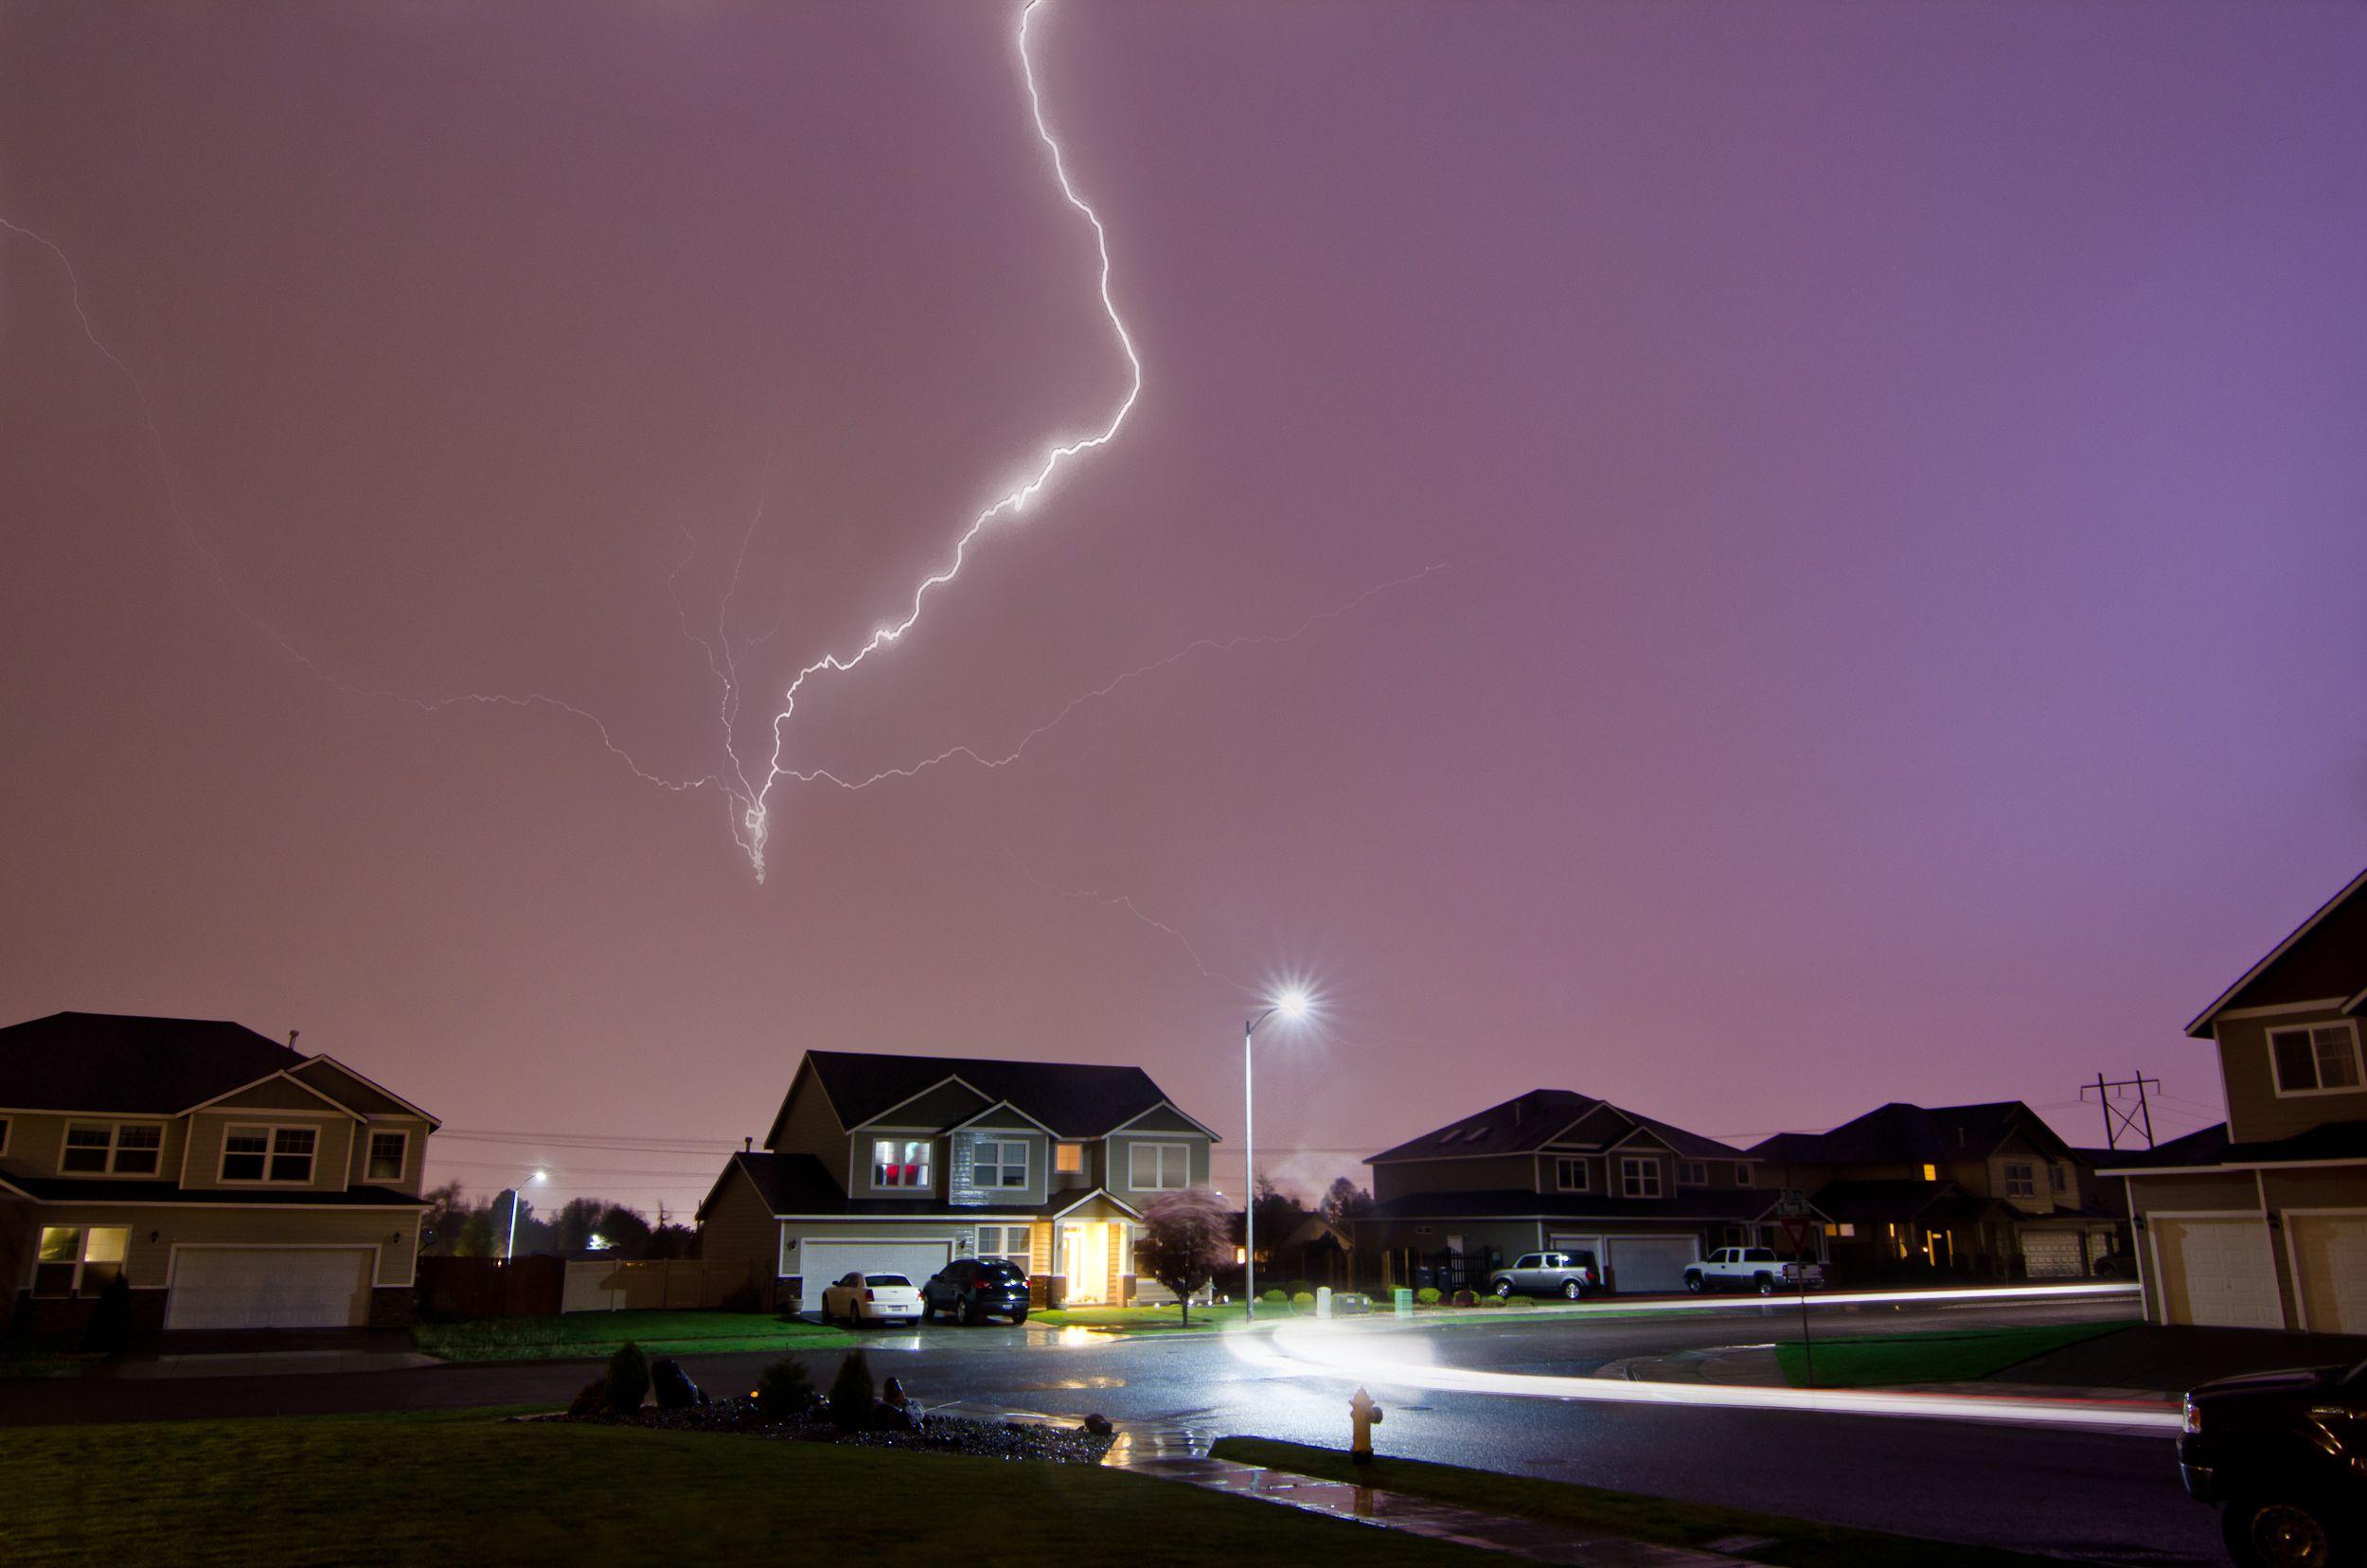 kids safe during severe thunderstorms